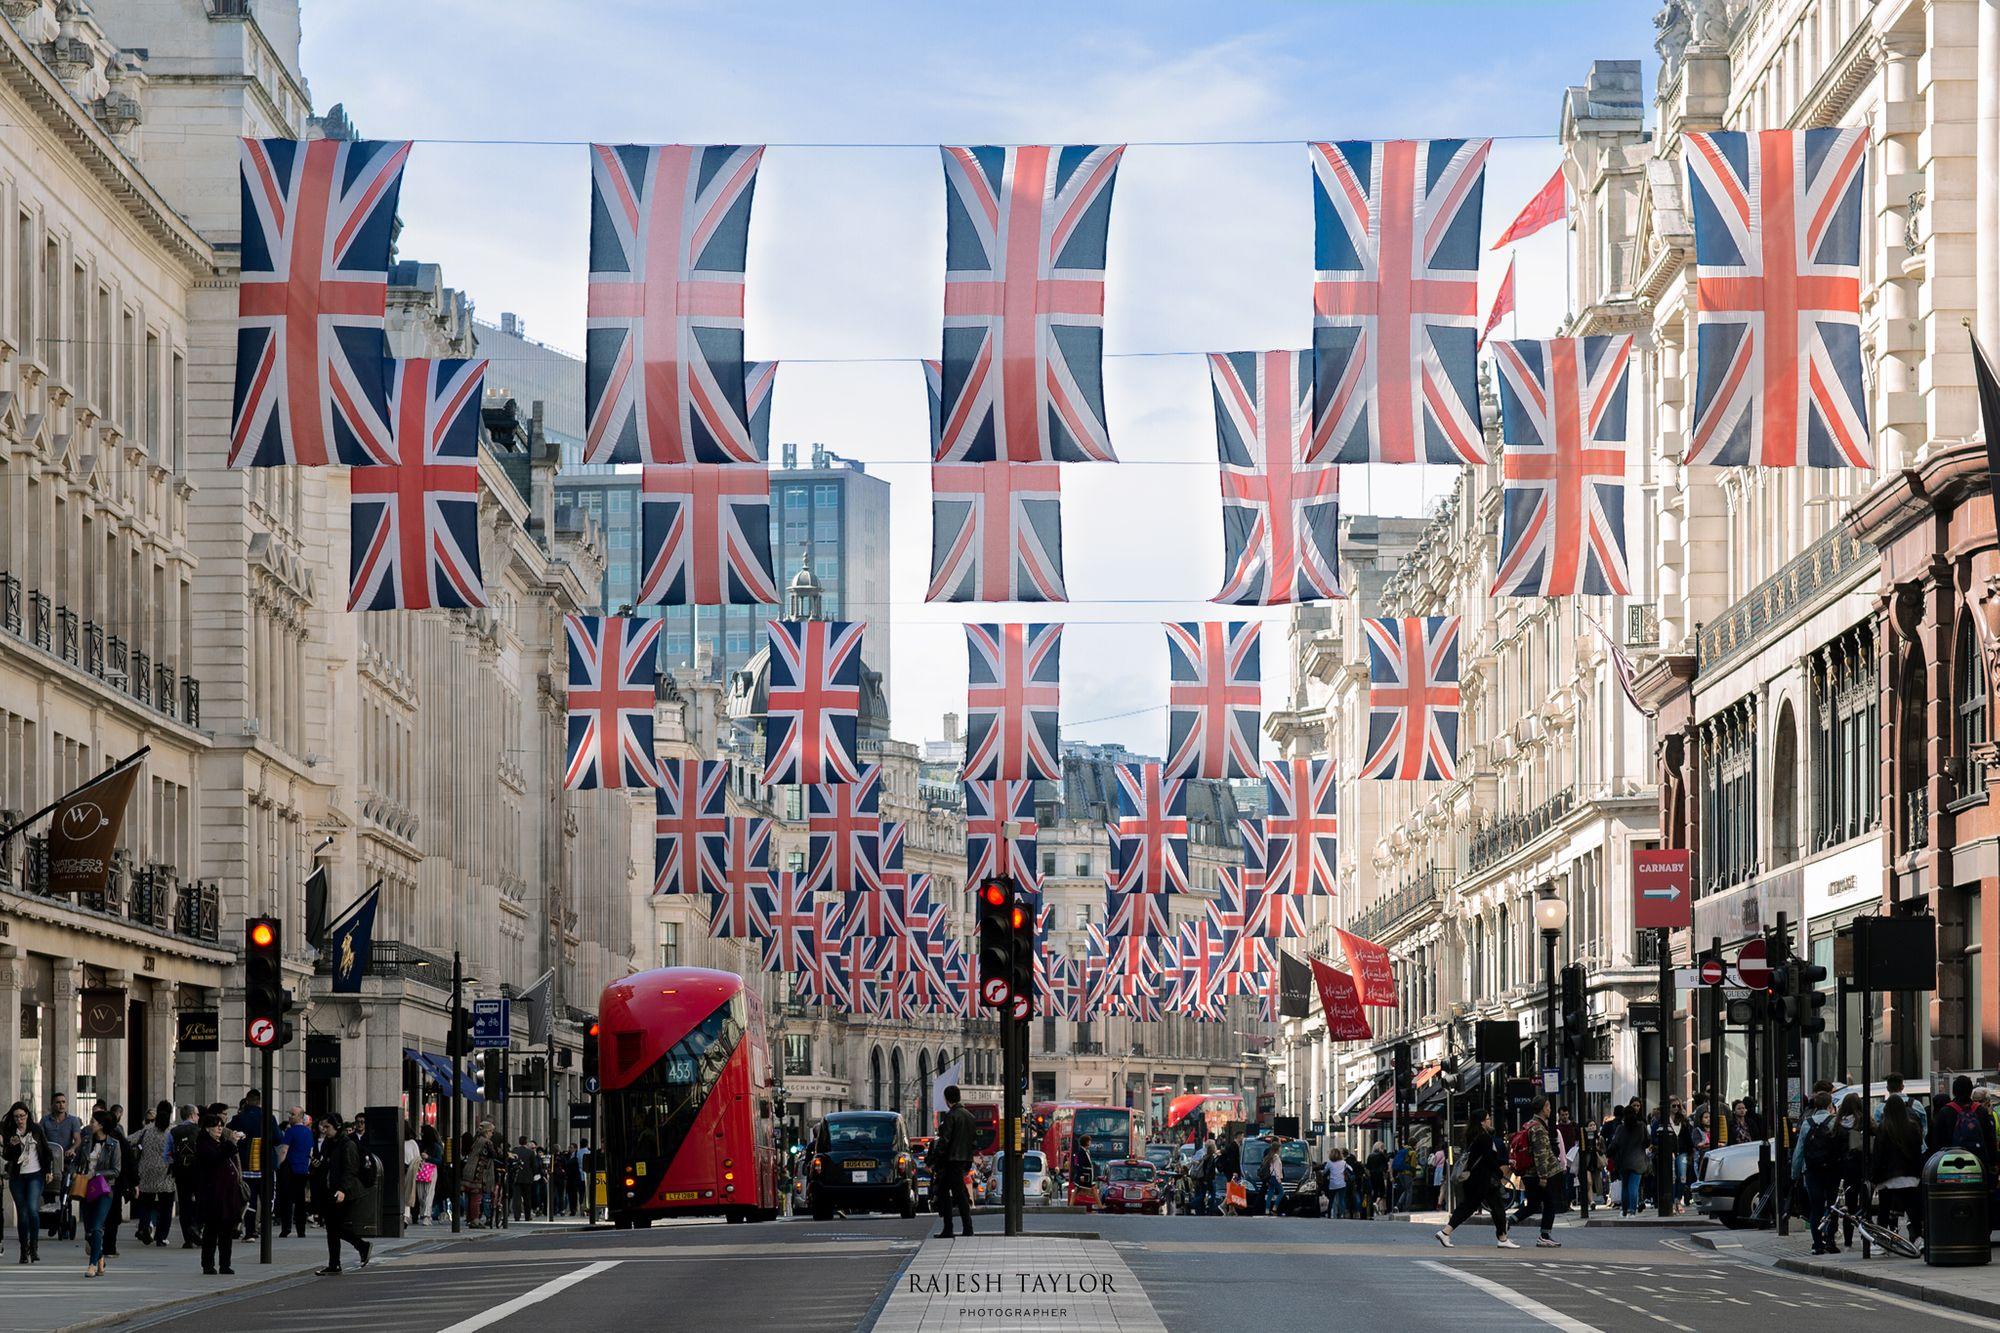 Regent Street, London ©Rajesh Taylor